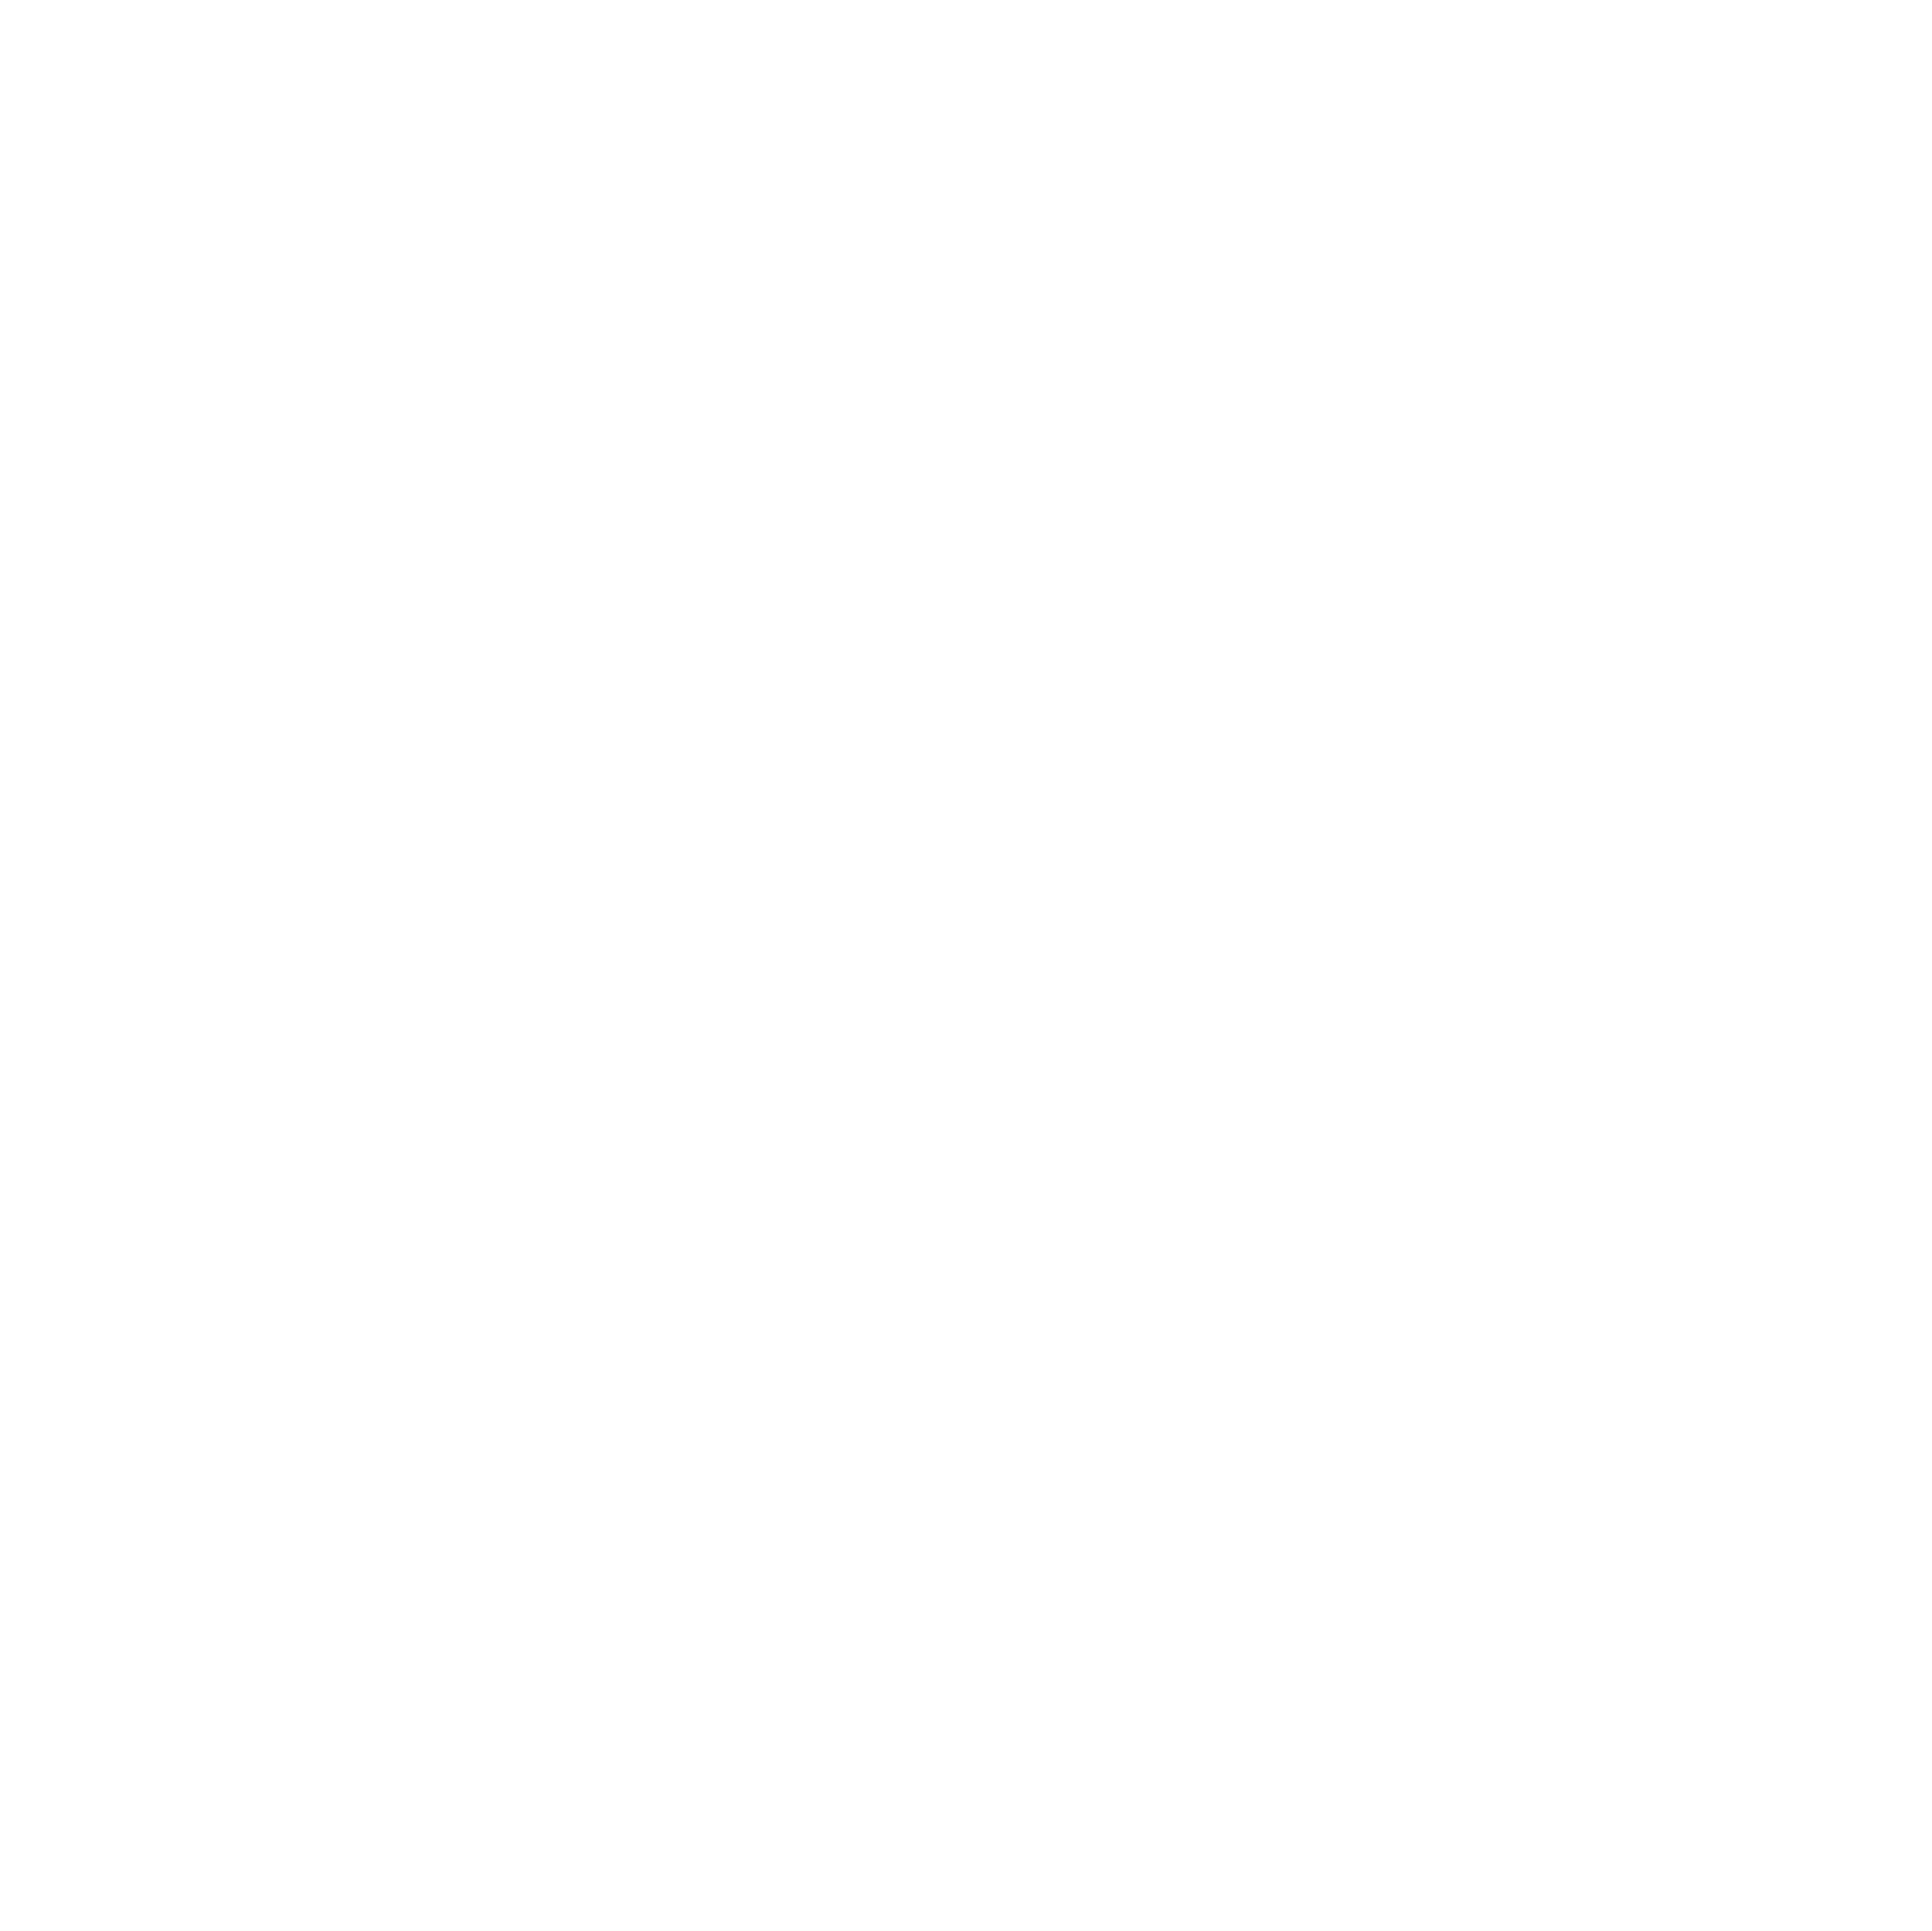 Government of Tajikistan